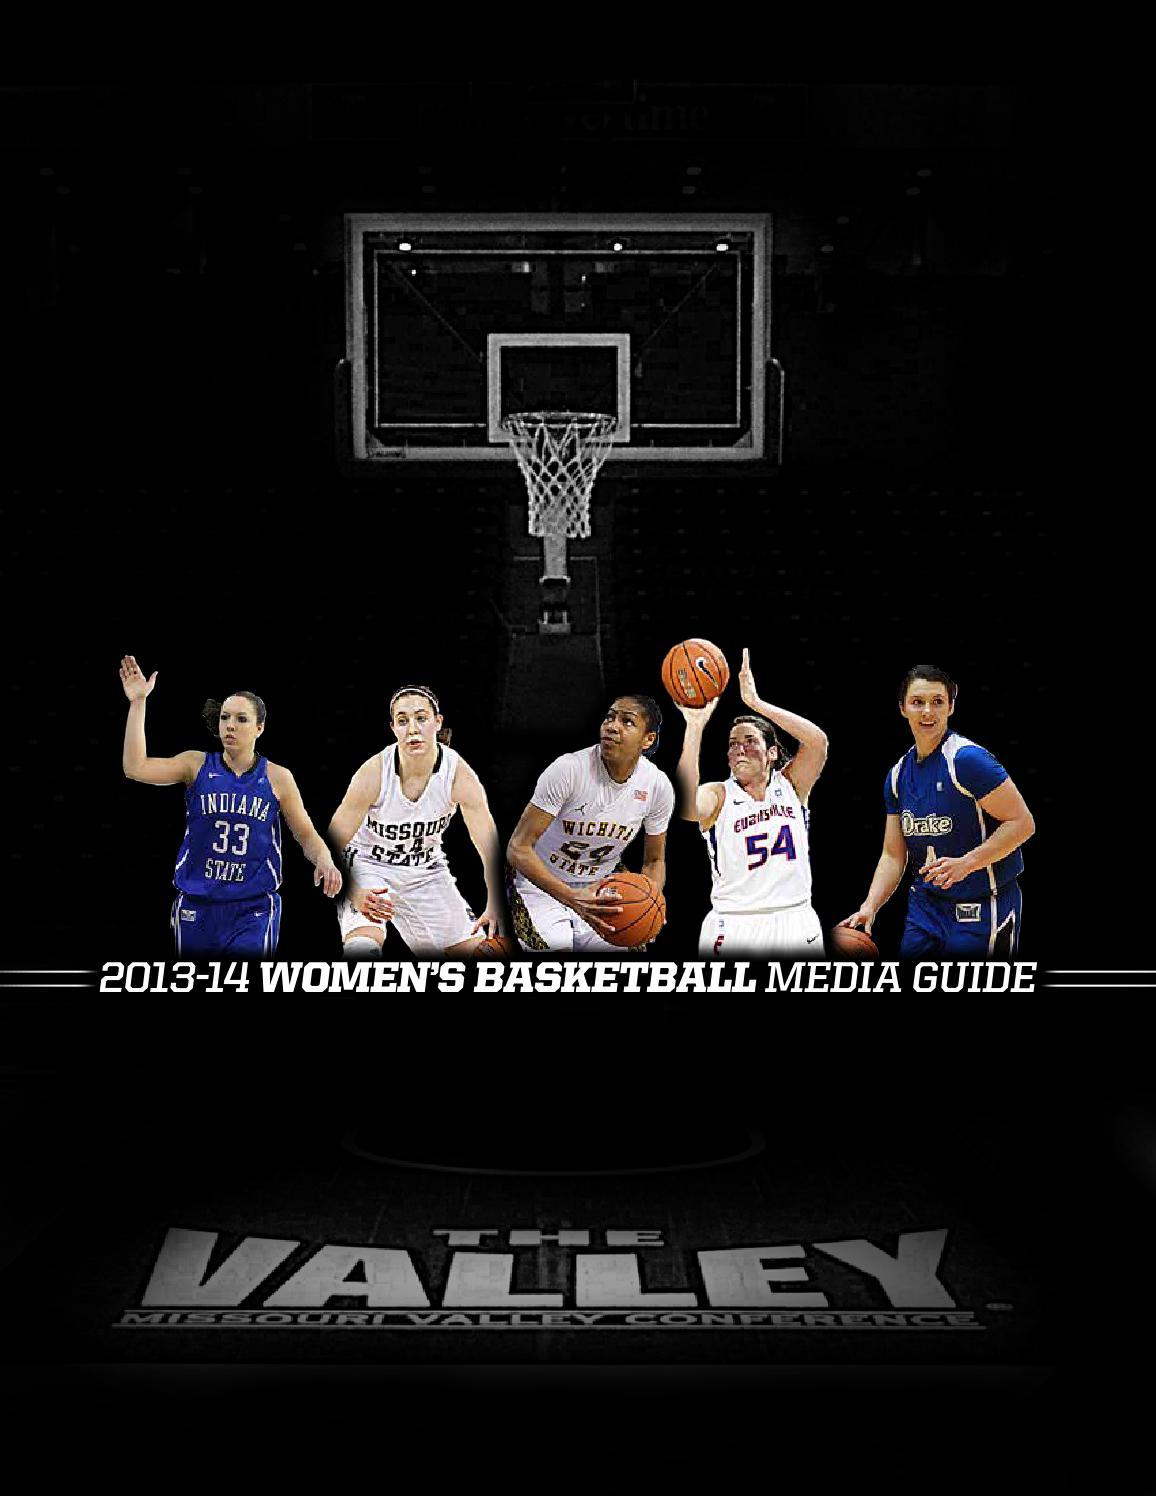 2013-14 Missouri Valley Conference Women's Basketball Media